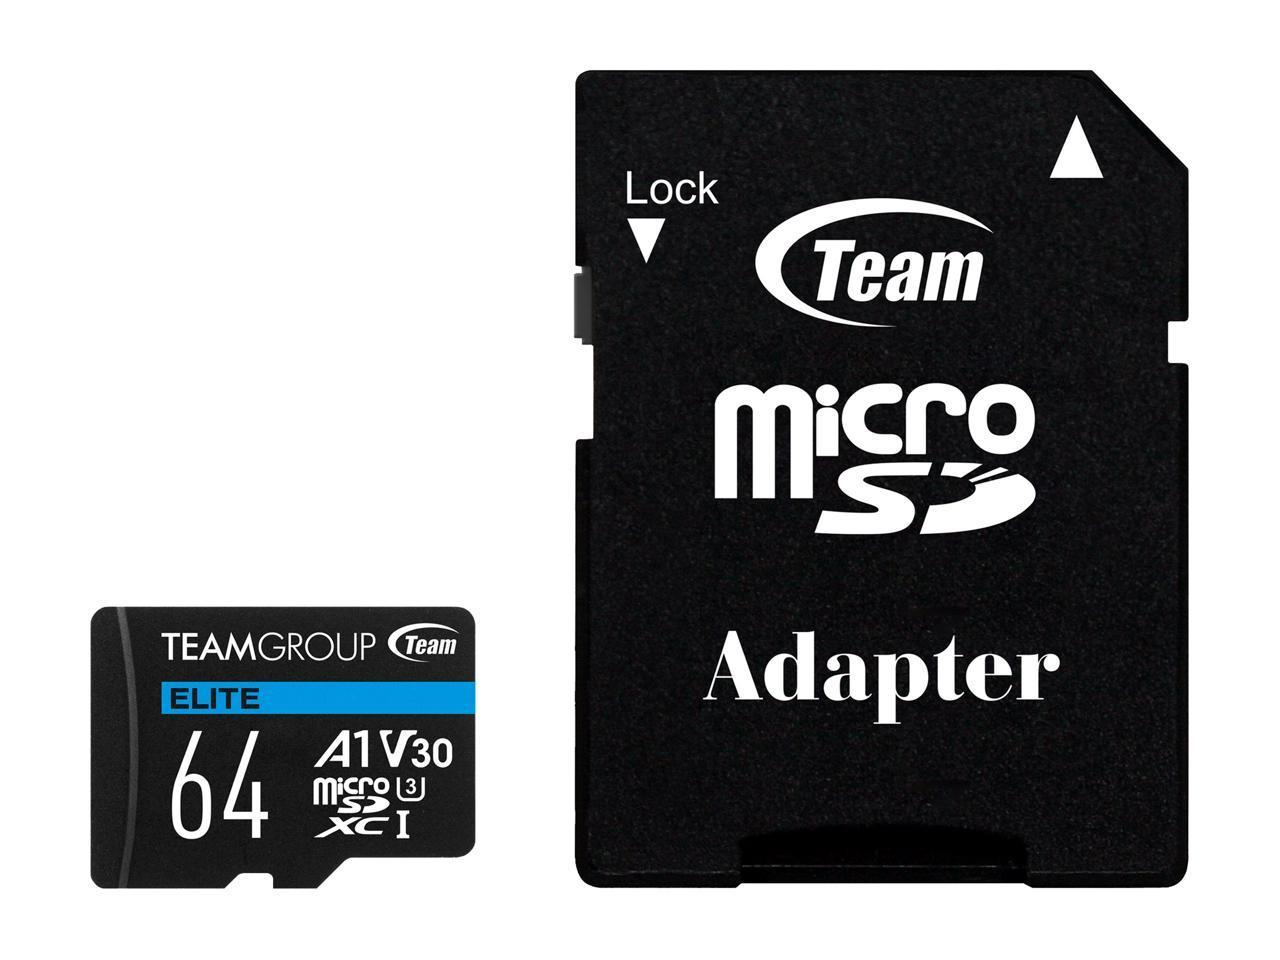 64GB Team Elite U3 A1 V30 microSD XC Memory Card @Newegg $7